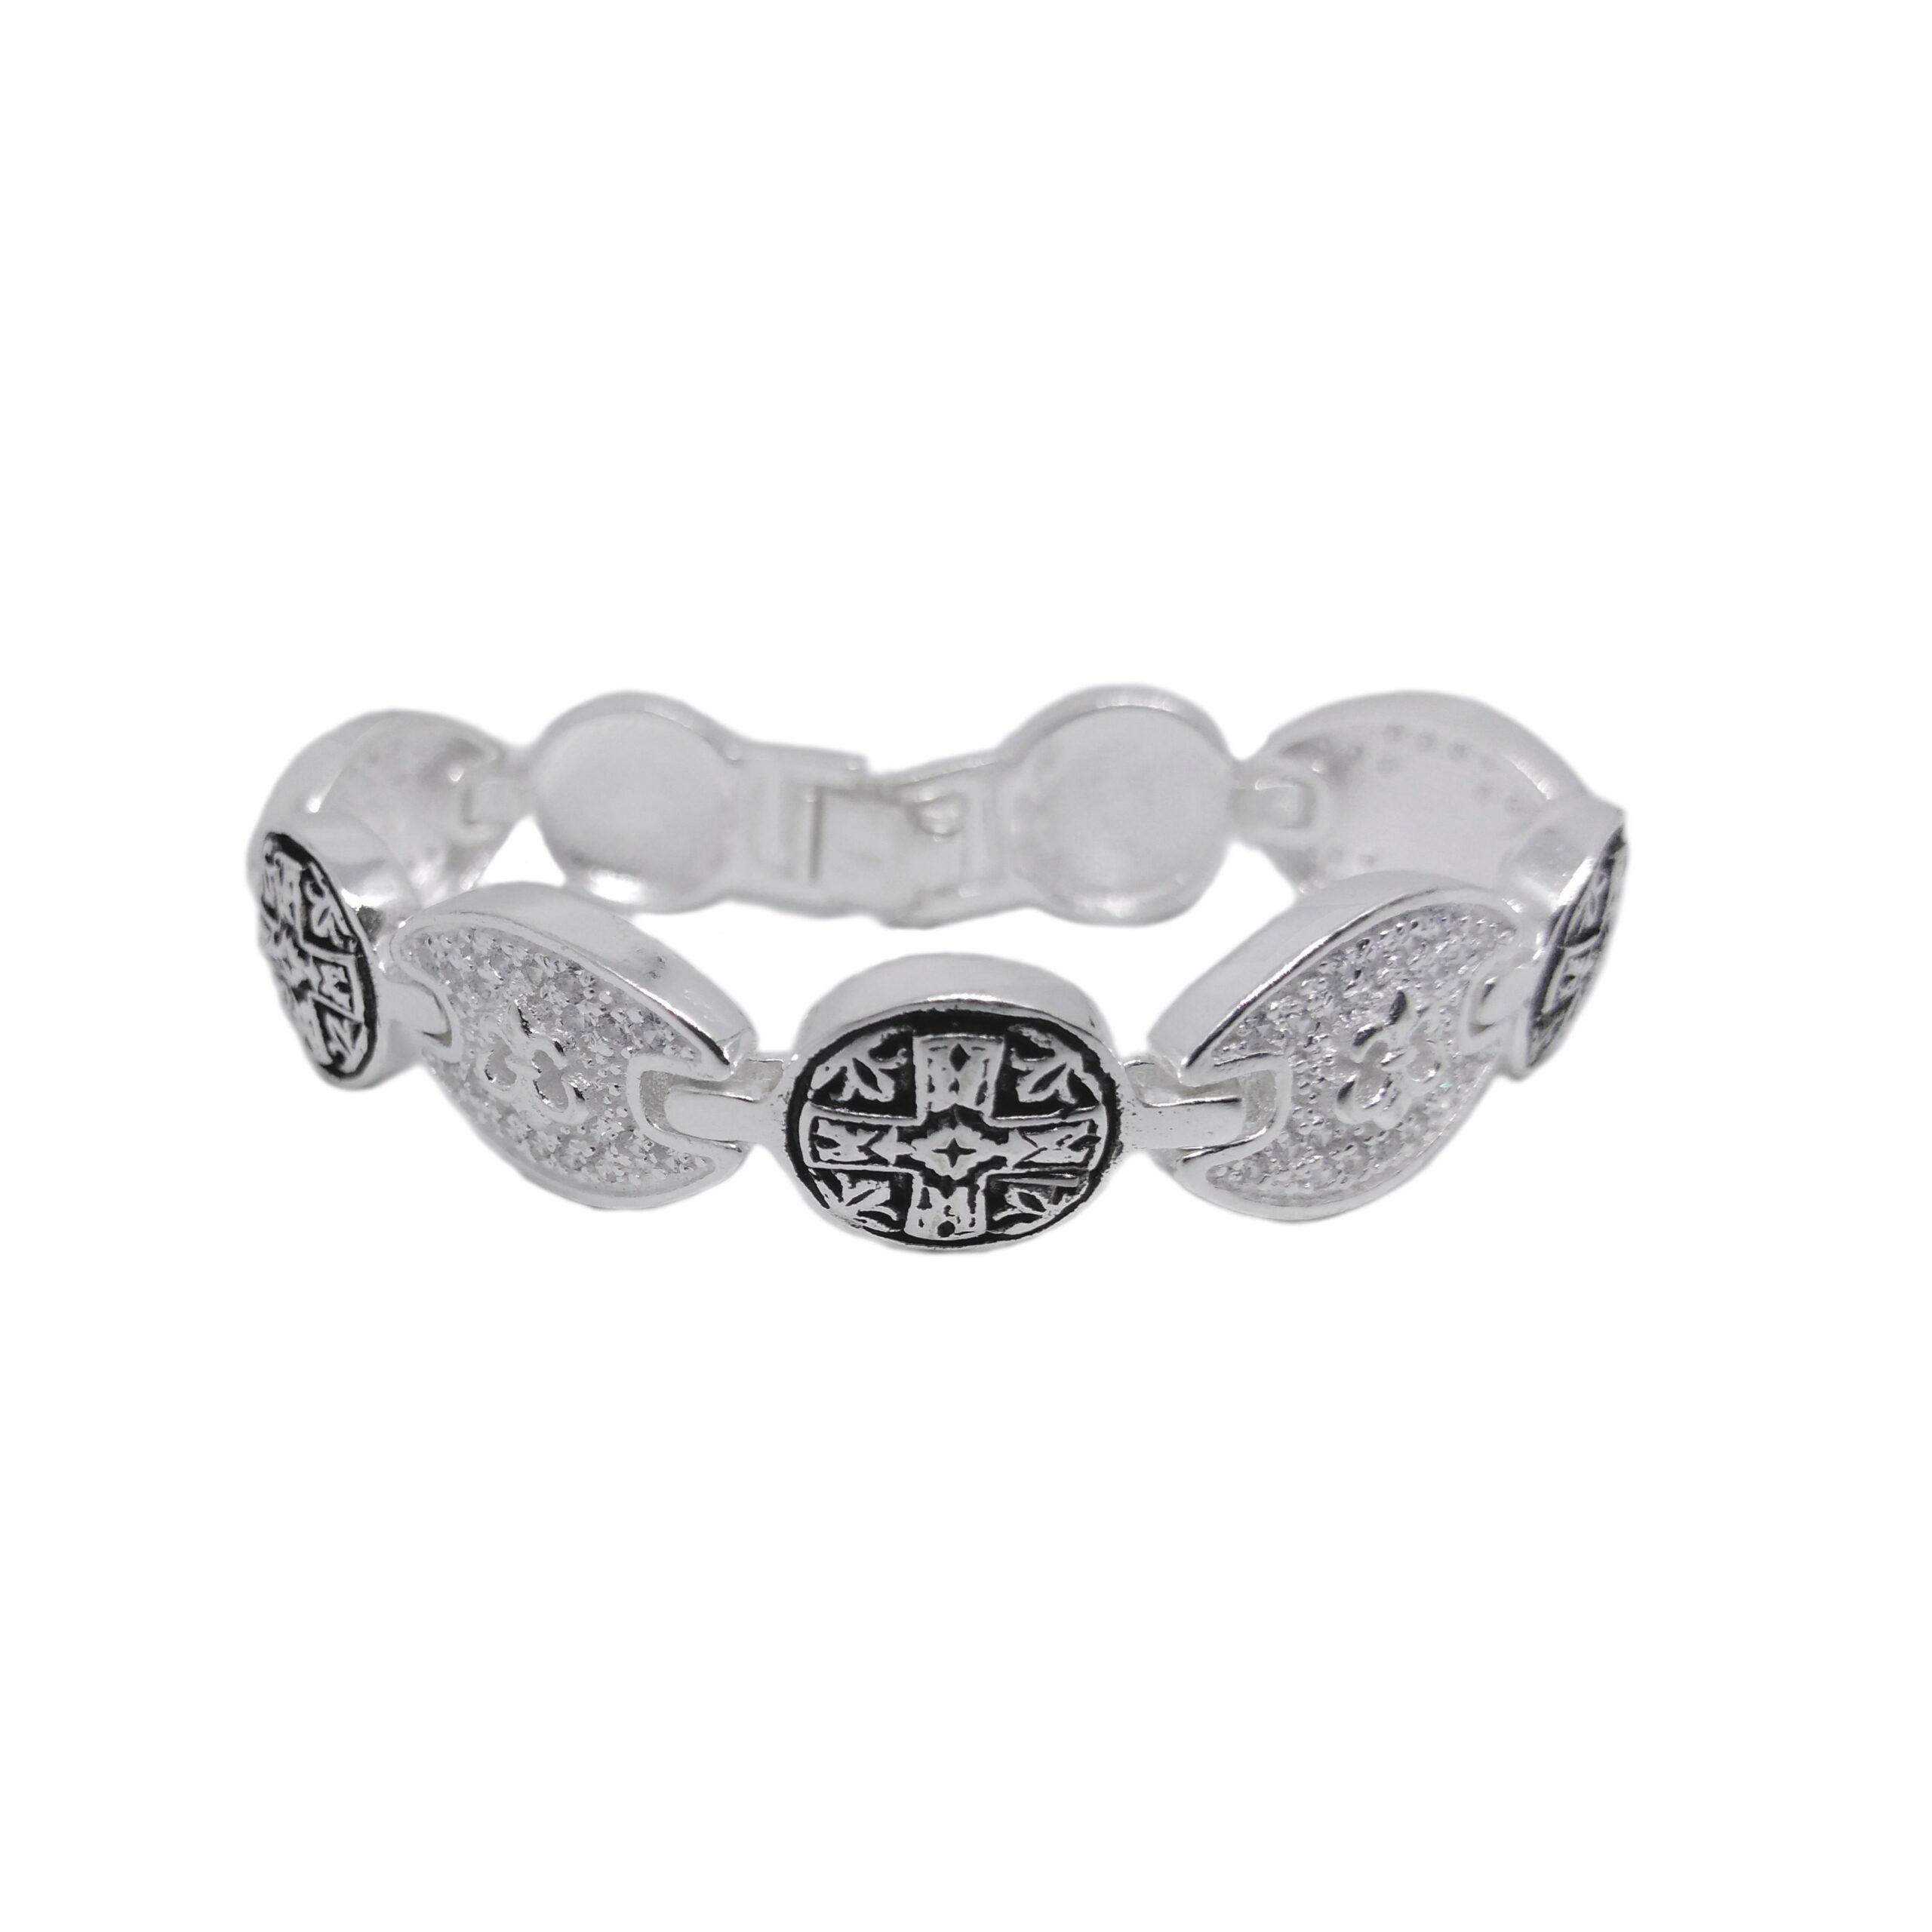 Anquist Silver Bracelet 2